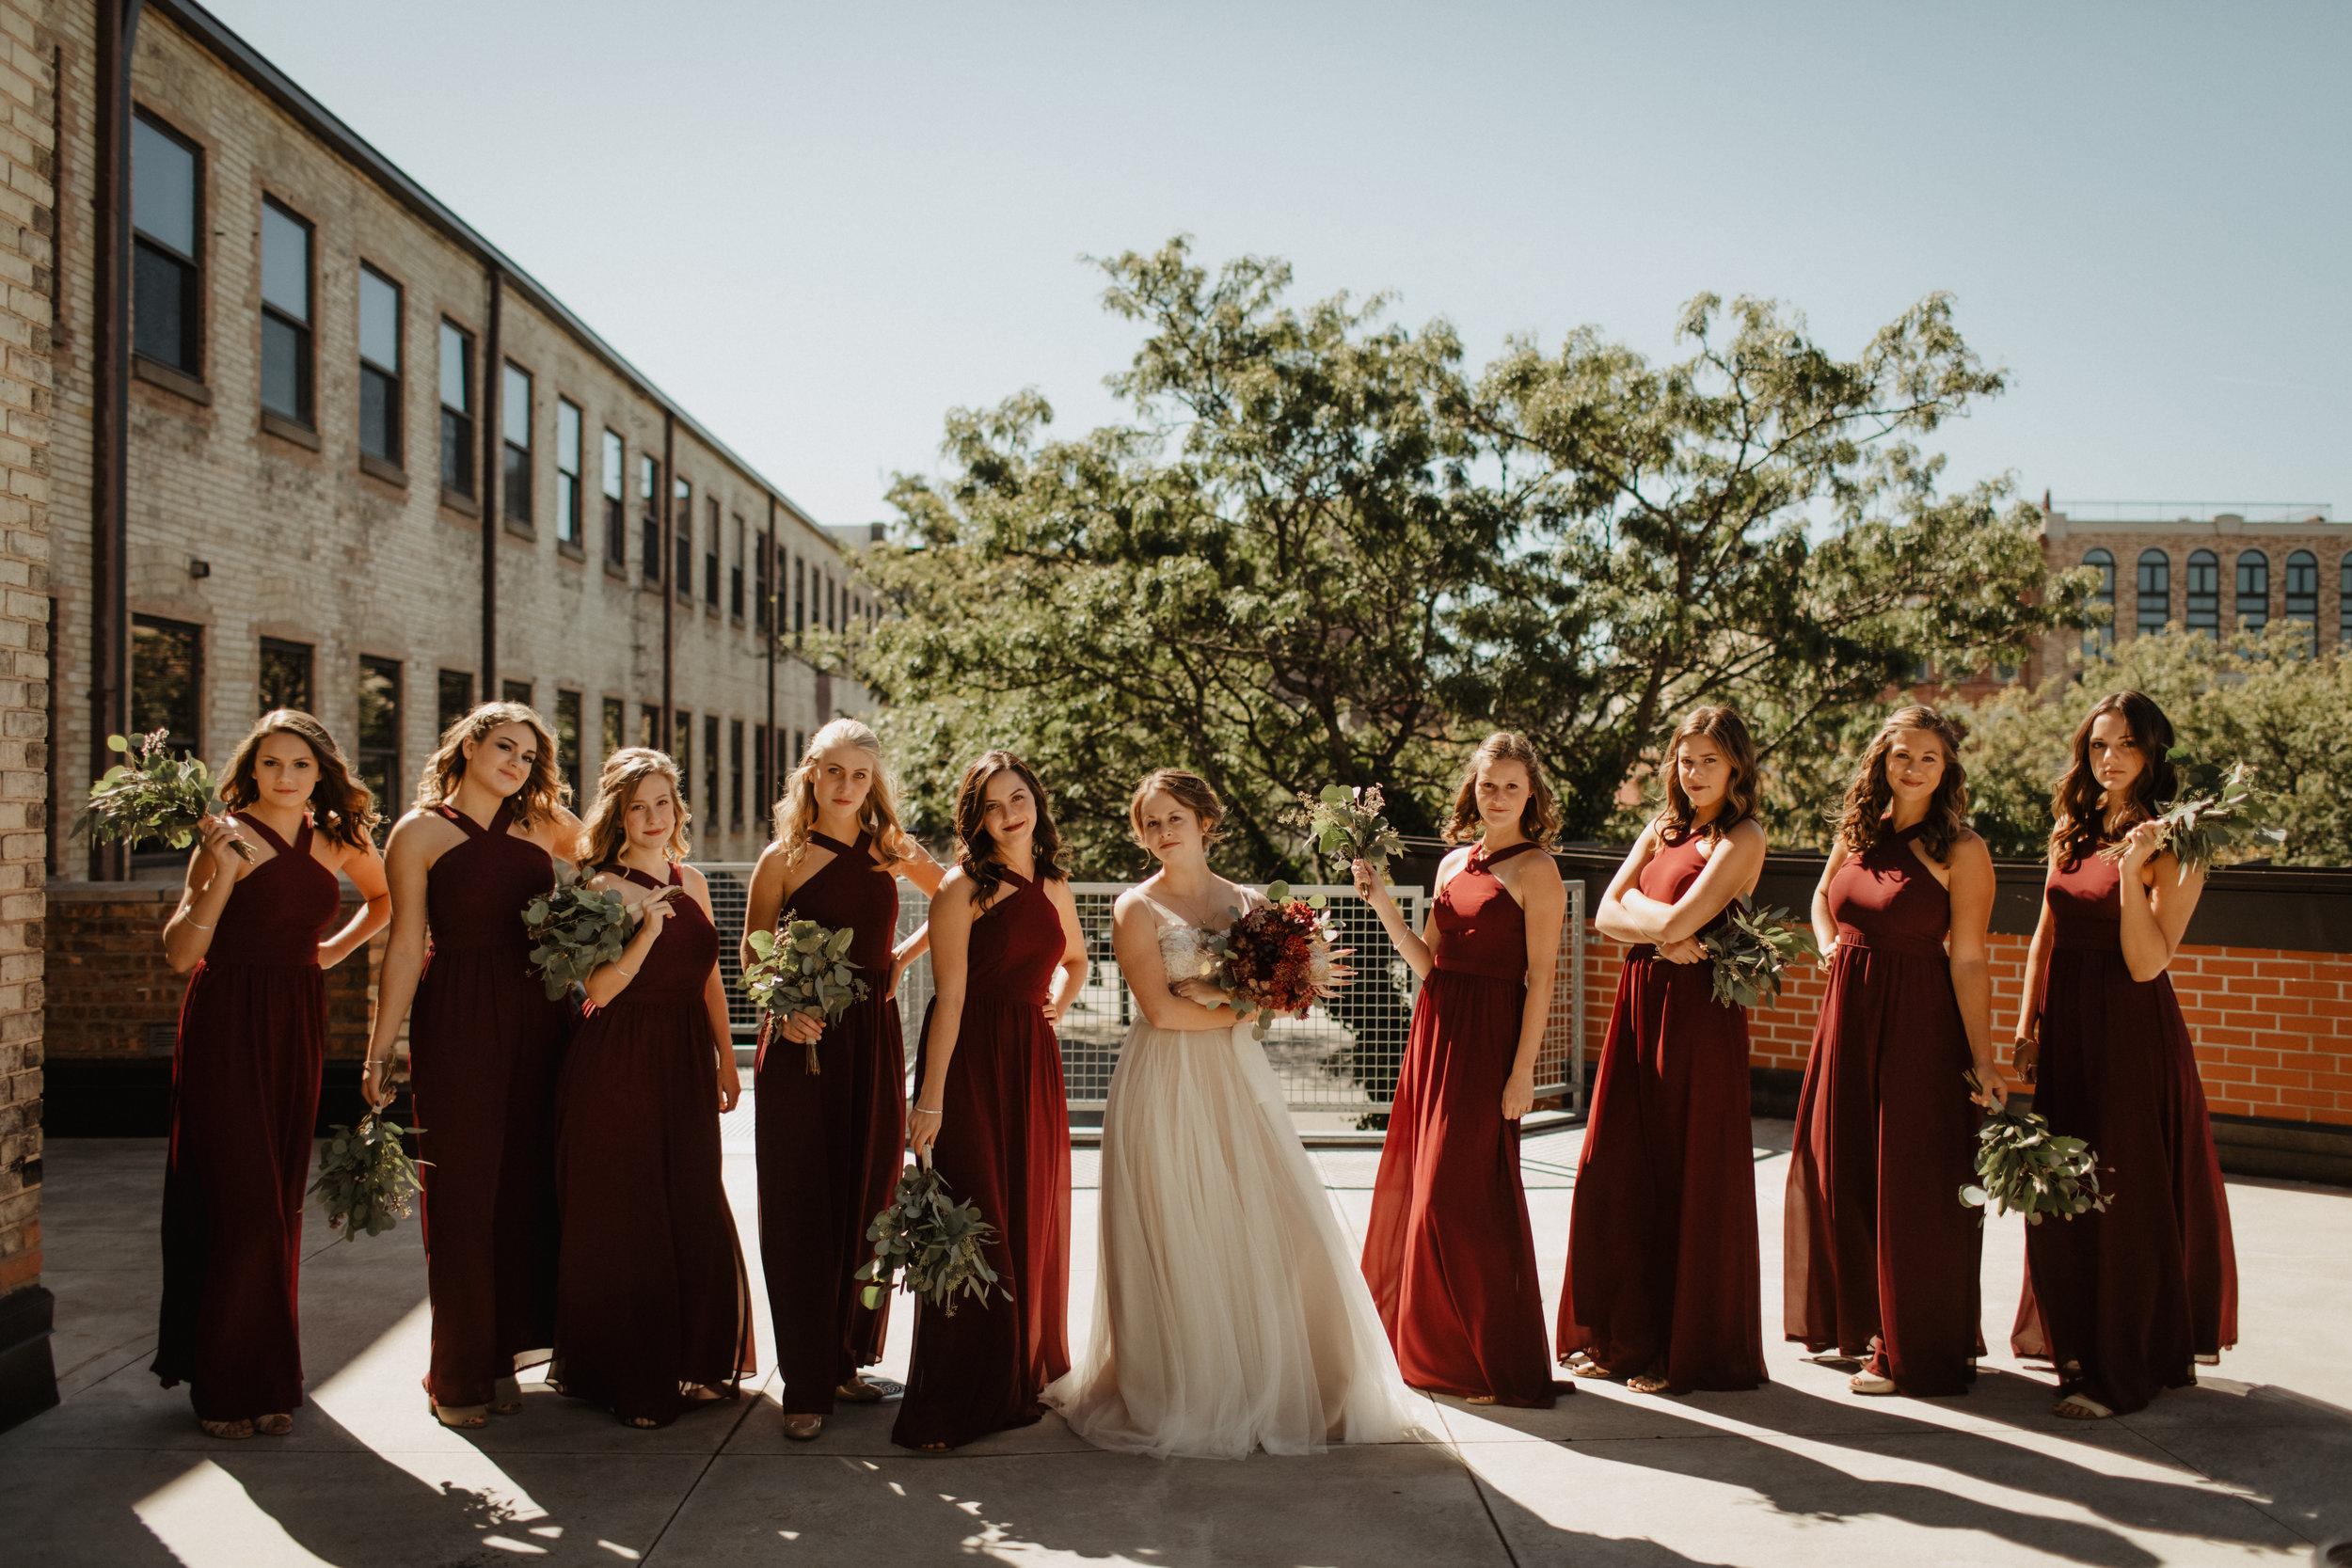 Cit-Bridesmaids-Photographer-02